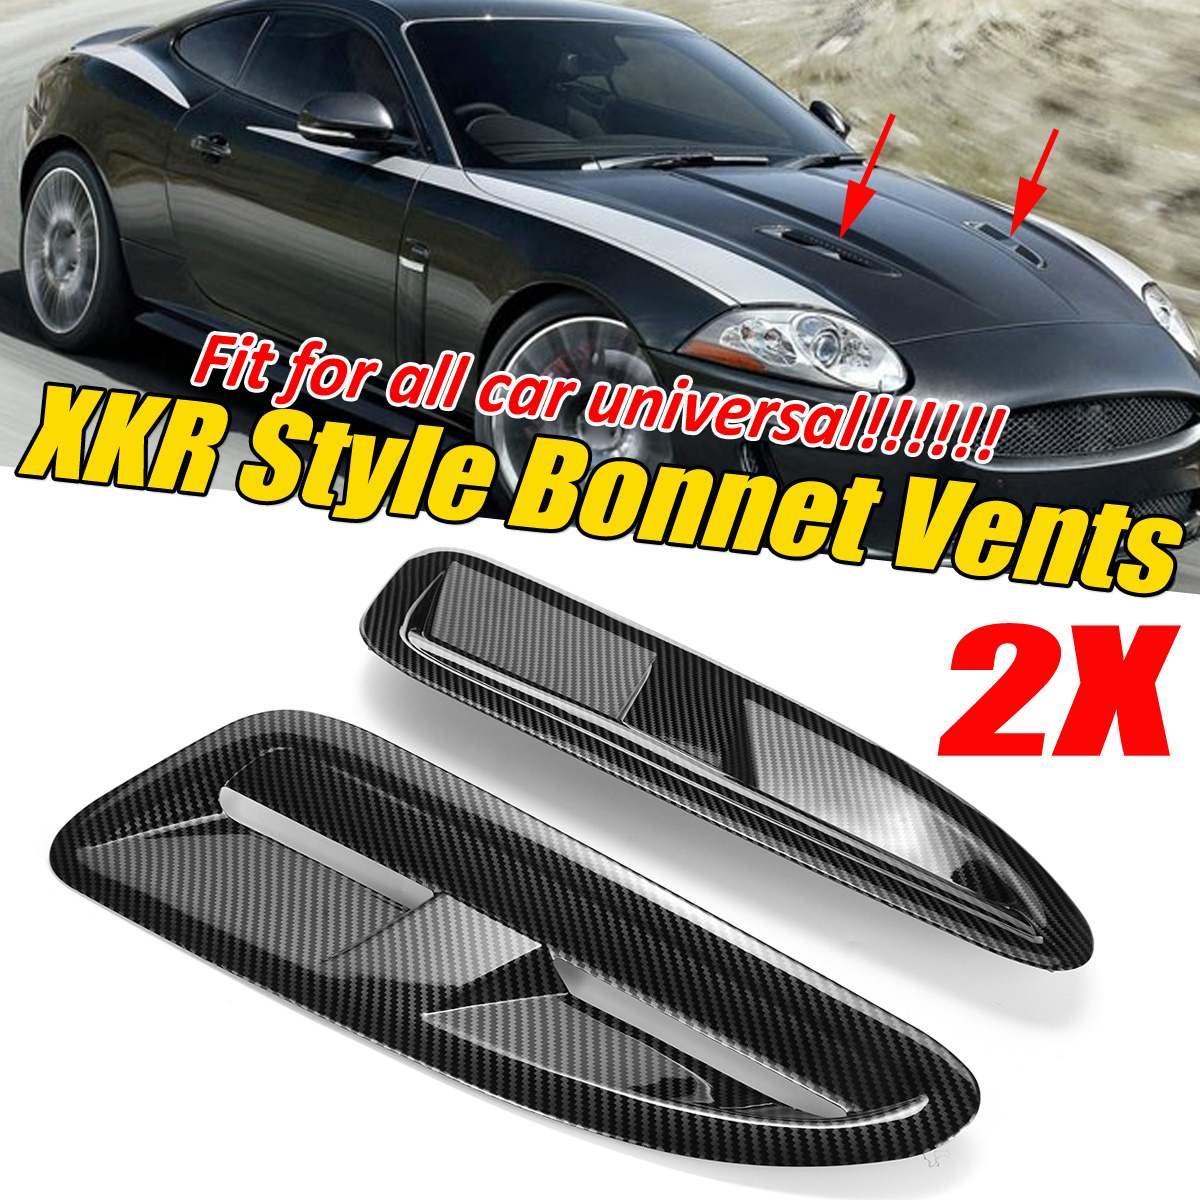 ABS coche universal capó de ventilación delantera para Jaguar XKR/XK8 para BMW F10/F11 para Benz W205 W204 para VW Golf MK5 MK6 MK7 para Ford